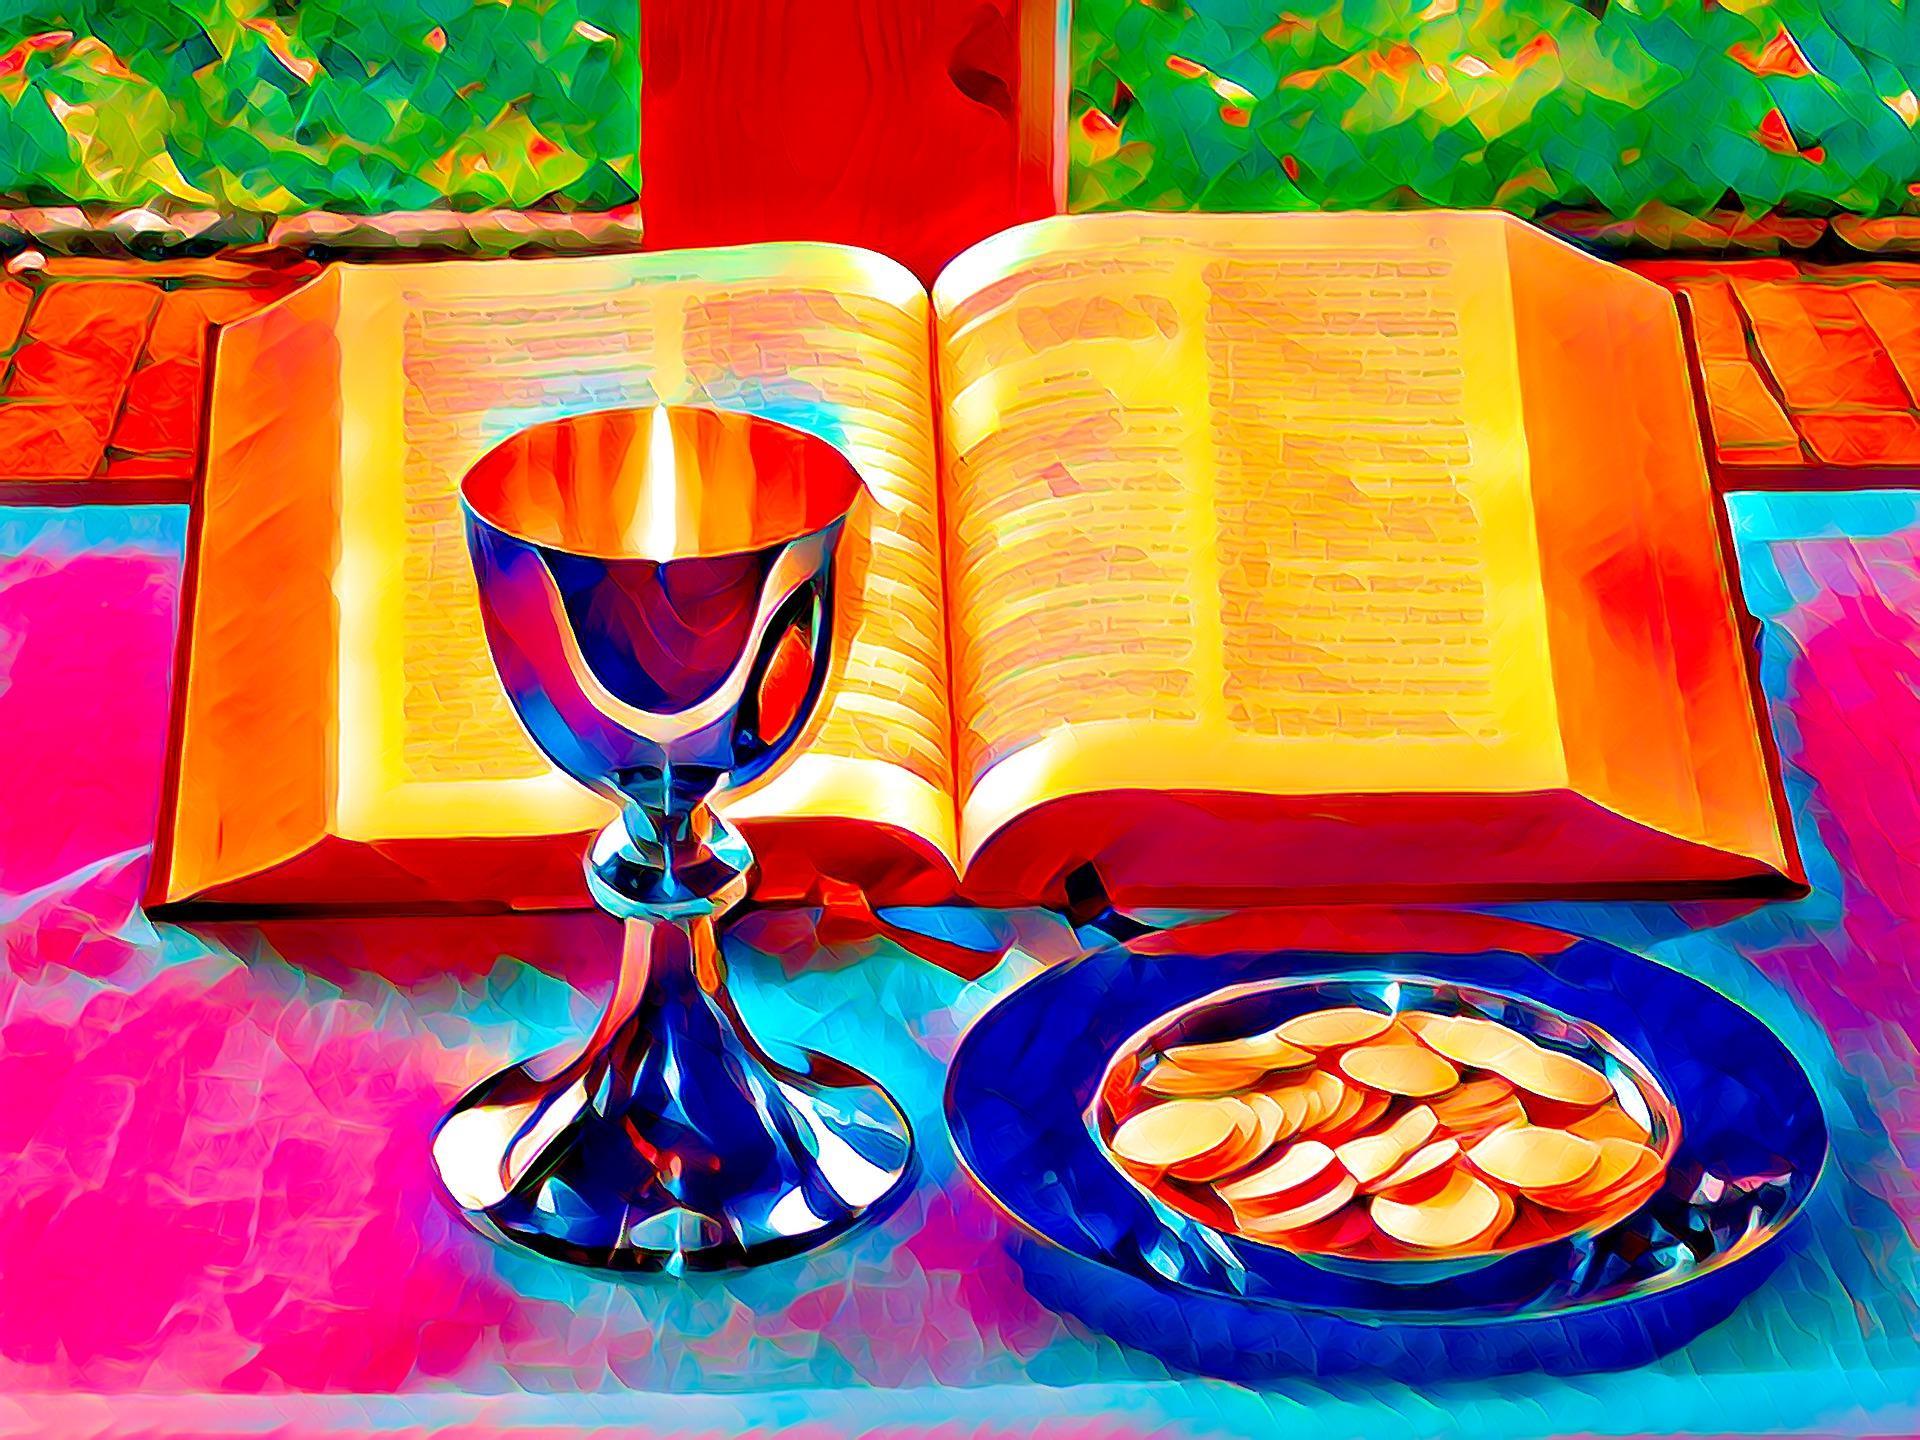 Vangelo e calice per aucaristia